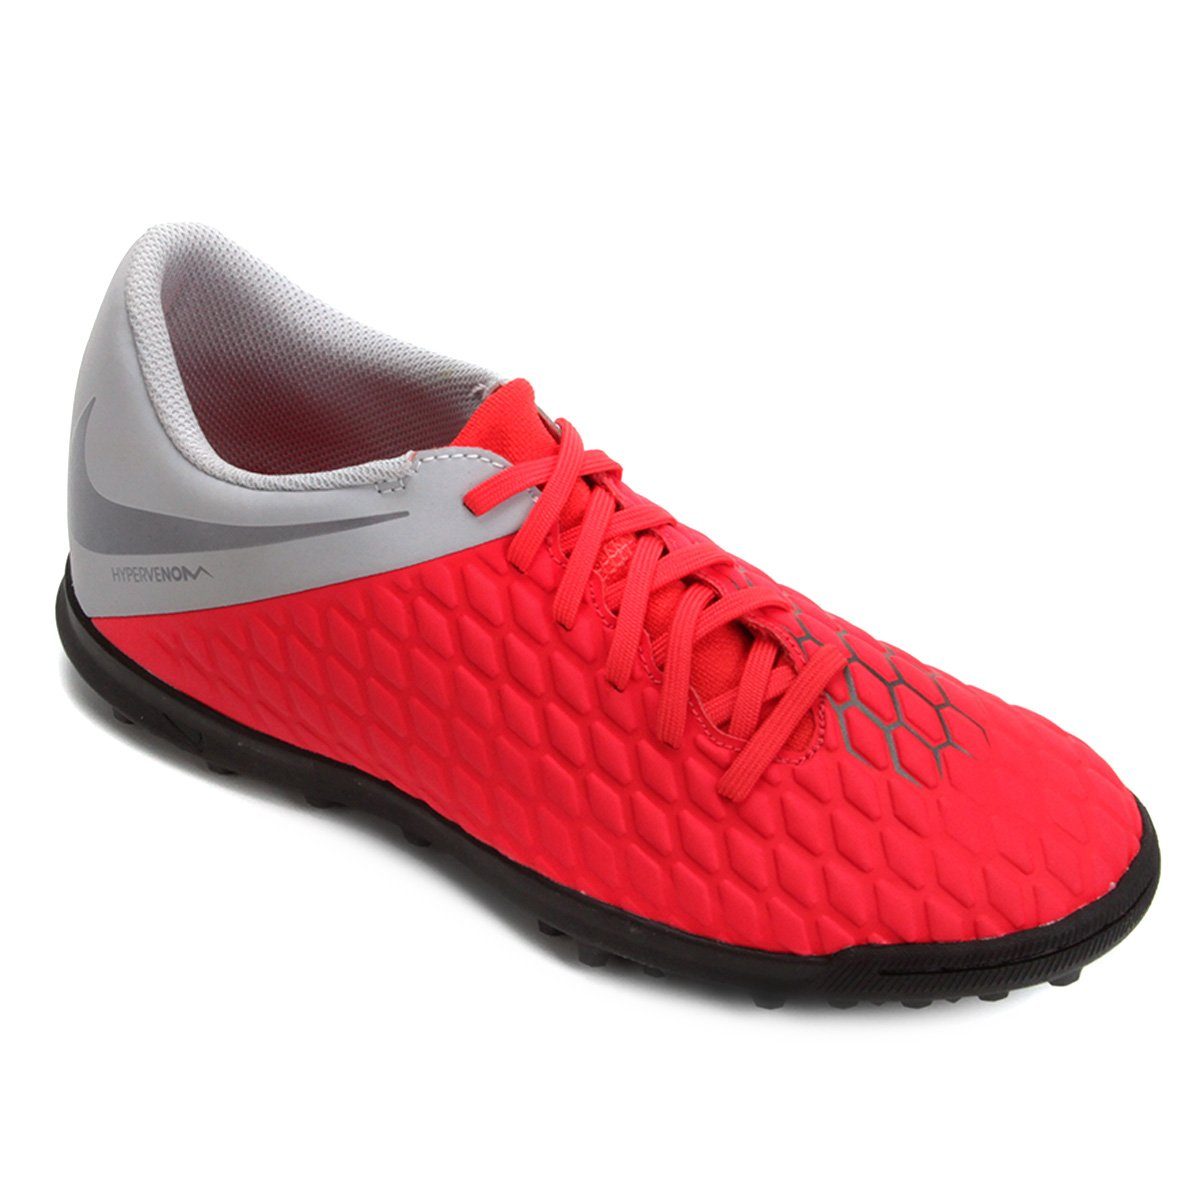 ade629547ae22 Chuteira Society Nike Hypervenom Phantom 3 Club TF - Vermelho e Cinza -  Compre Agora